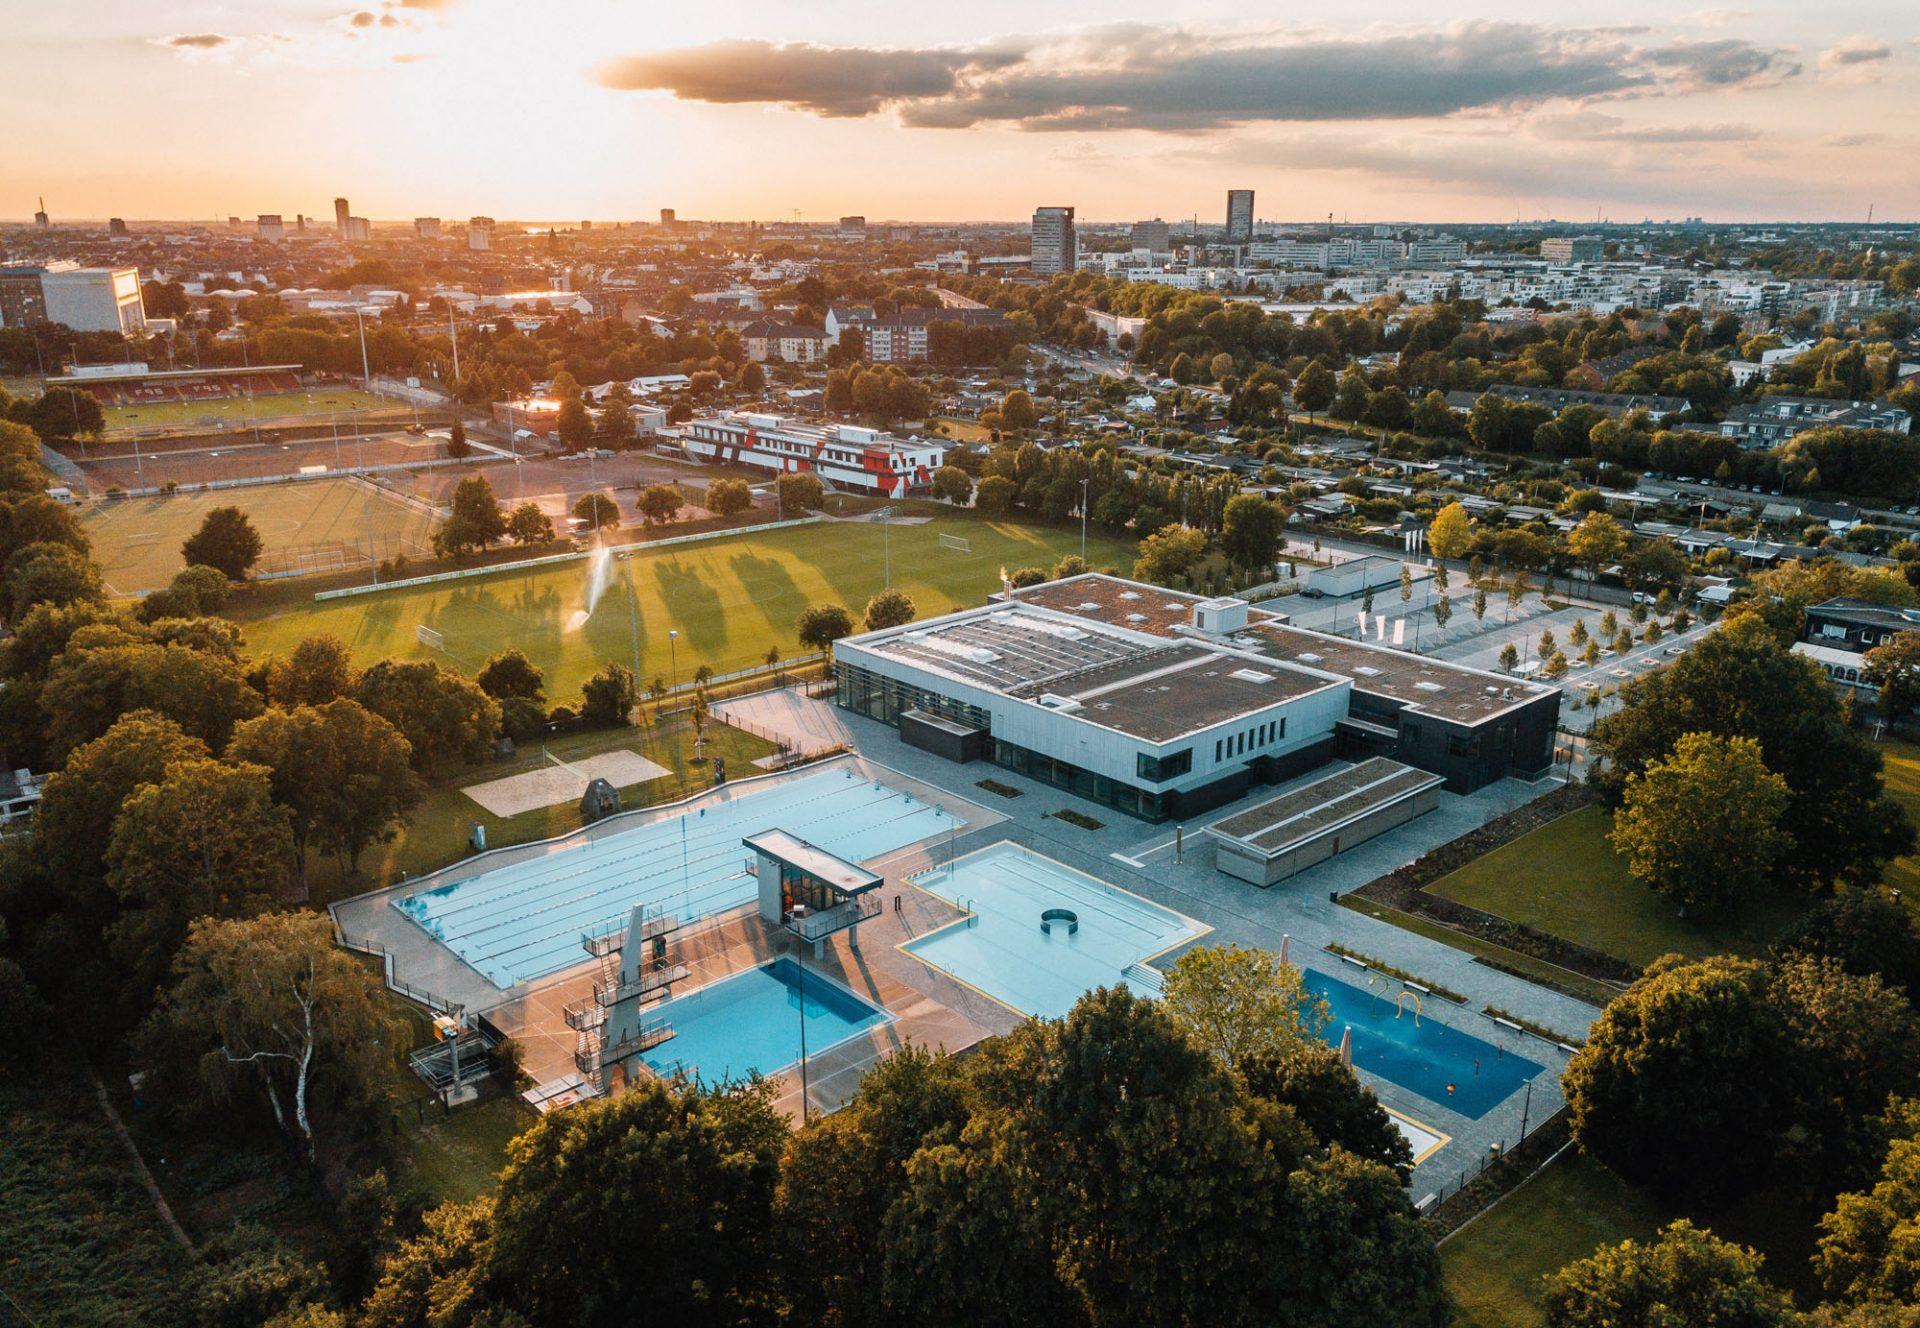 Fotograf mit Drohne in Köln © Offenblende / Joshua JAH